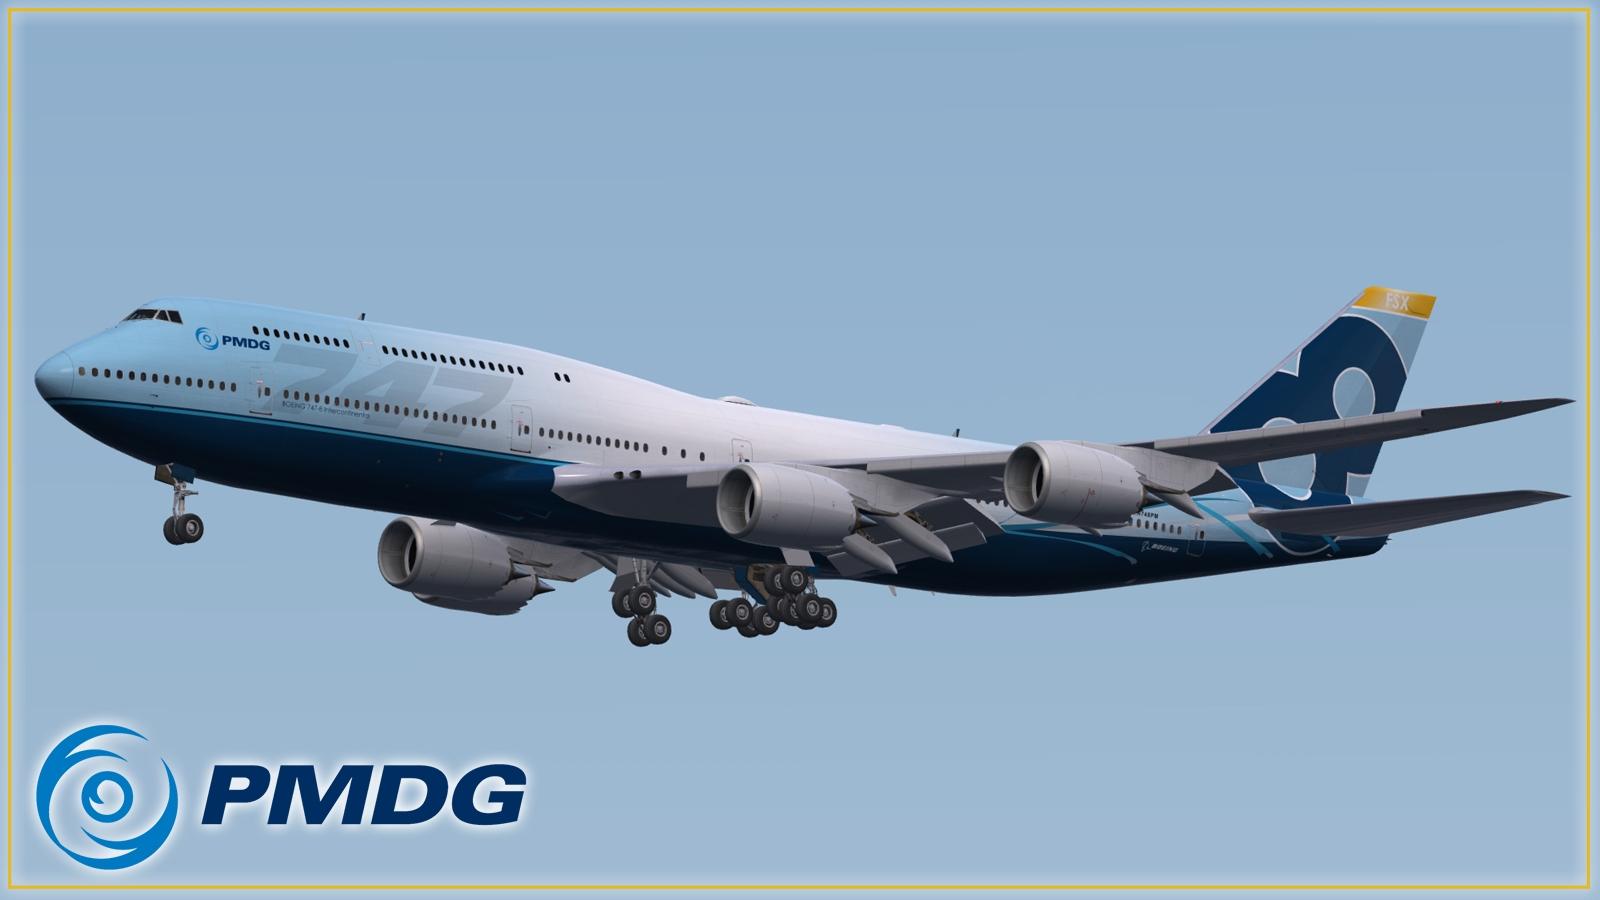 Ótima notícia, 747 PMDG PMDG_748_approach